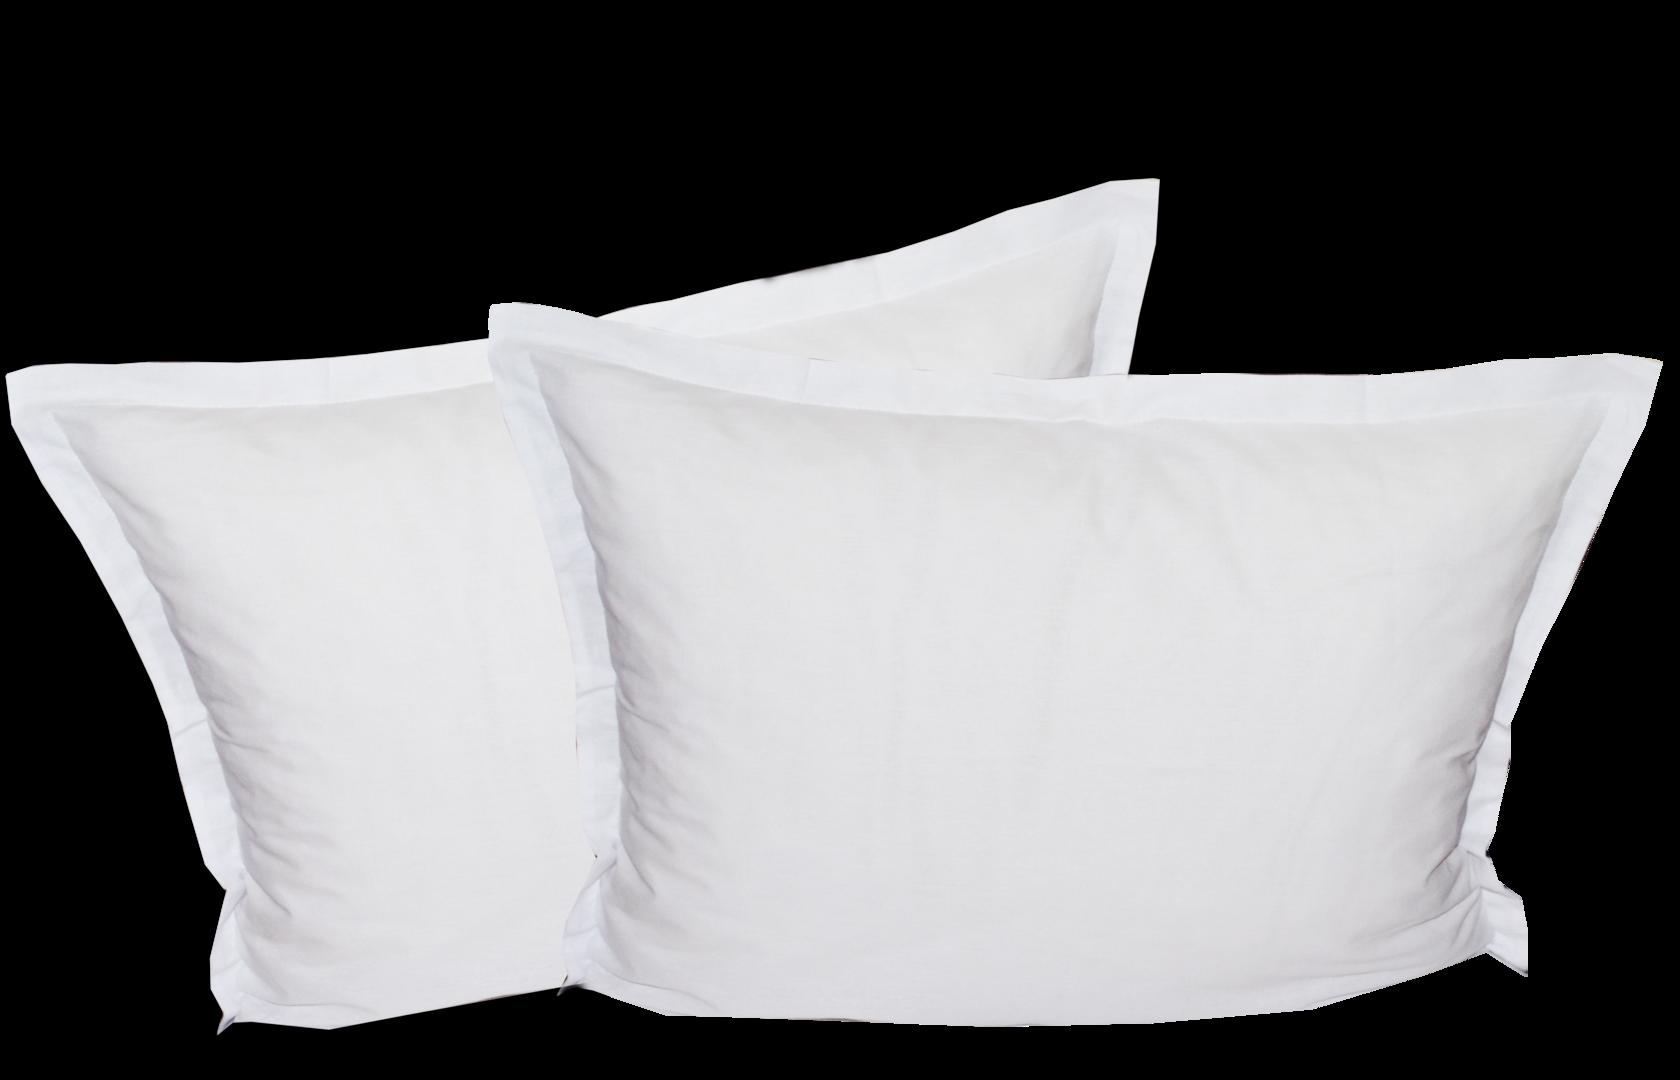 Pillow Png Image Pillows Pastel Pillows Kids Pillow Cases